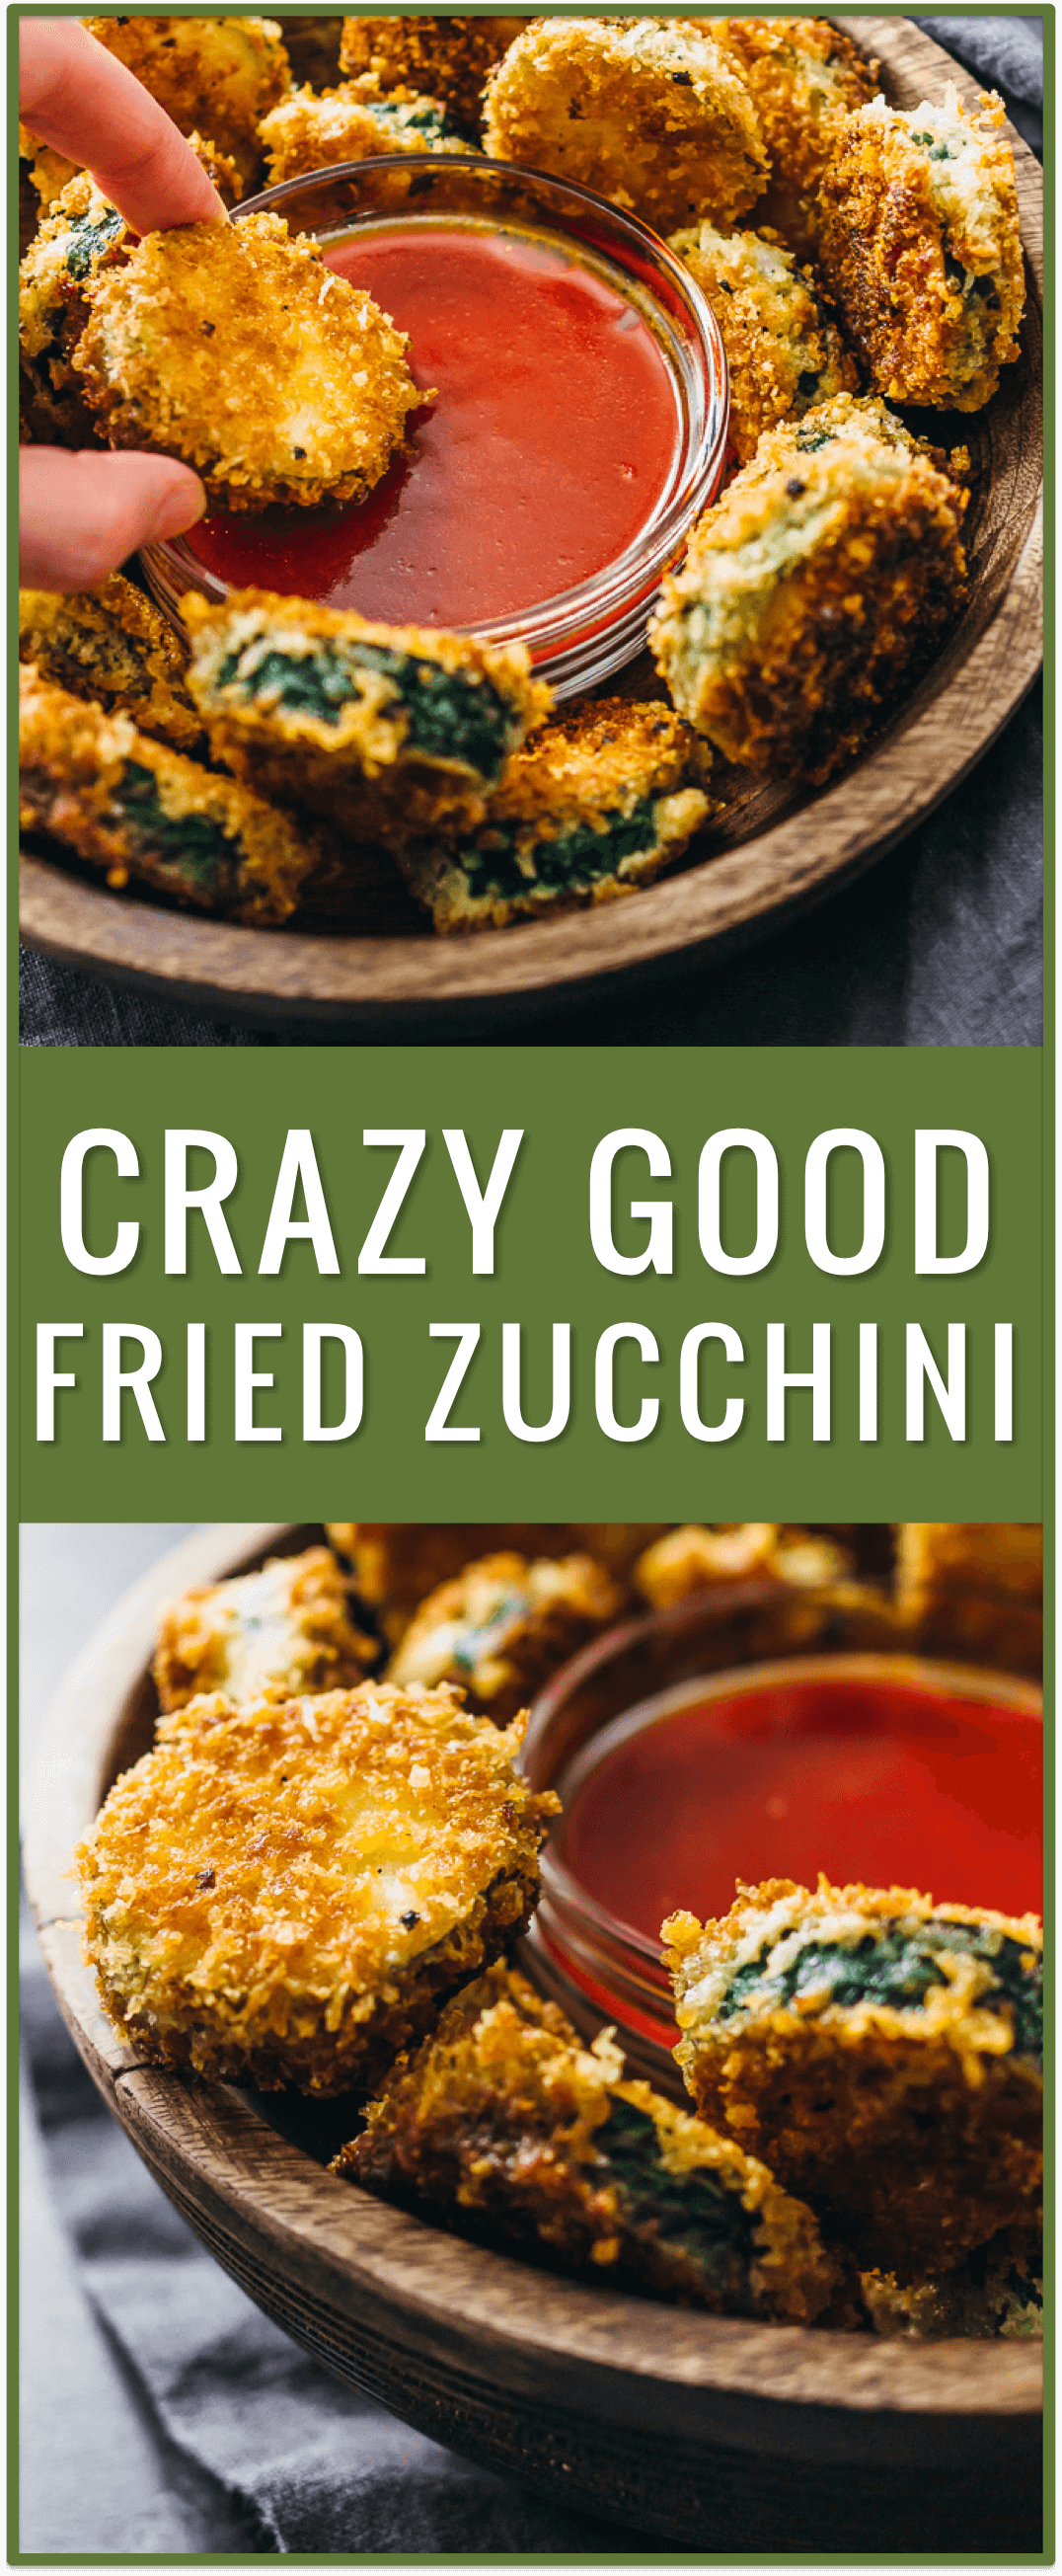 Crazy good fried zucchini, pan fried zucchini with flour, easy fried zucchini recipe, best fried zucchini dipping sauce, oven fried zucchini, zucchini sticks, families, zucchini chips, deep fried, batter, healthy, skillet